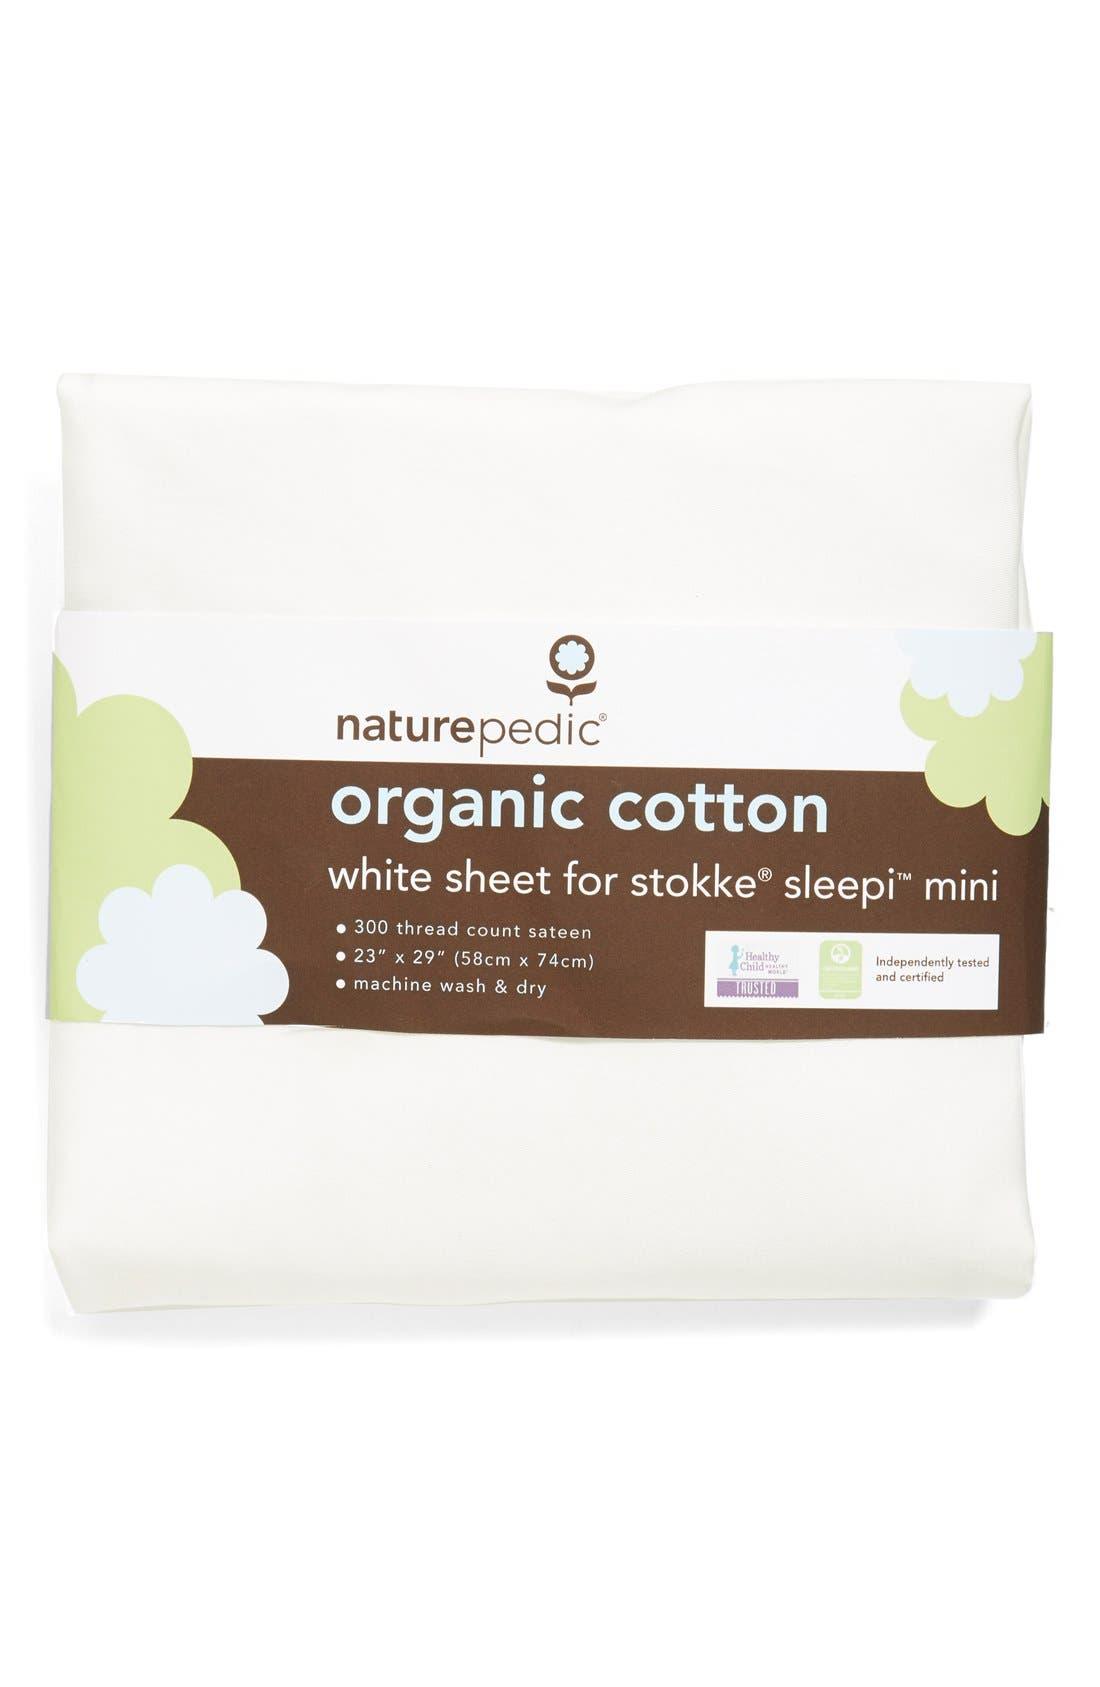 Naturepedic 300 Thread Count Organic Cotton Oval Crib Sheet for Stokke Sleepi Mini